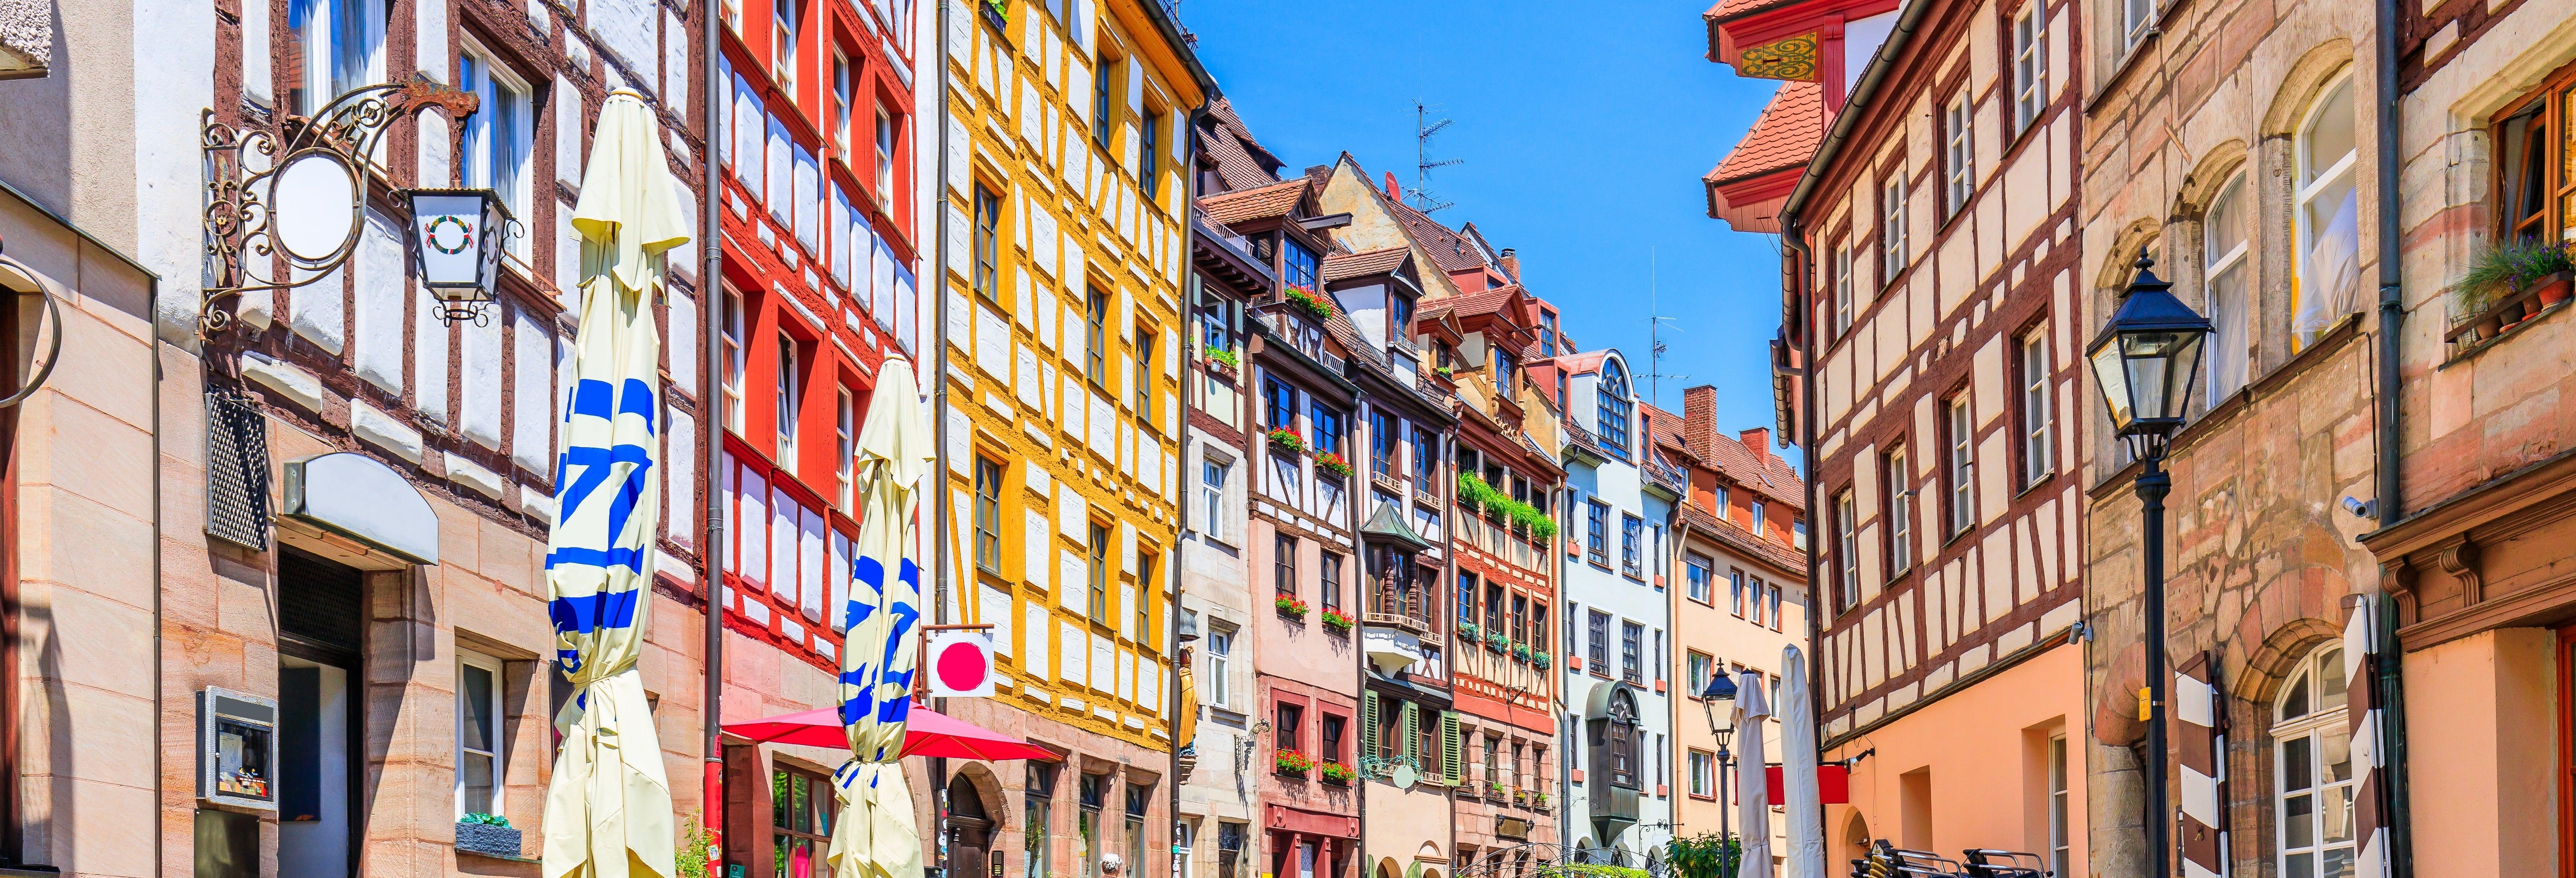 Tour pela Nuremberg medieval